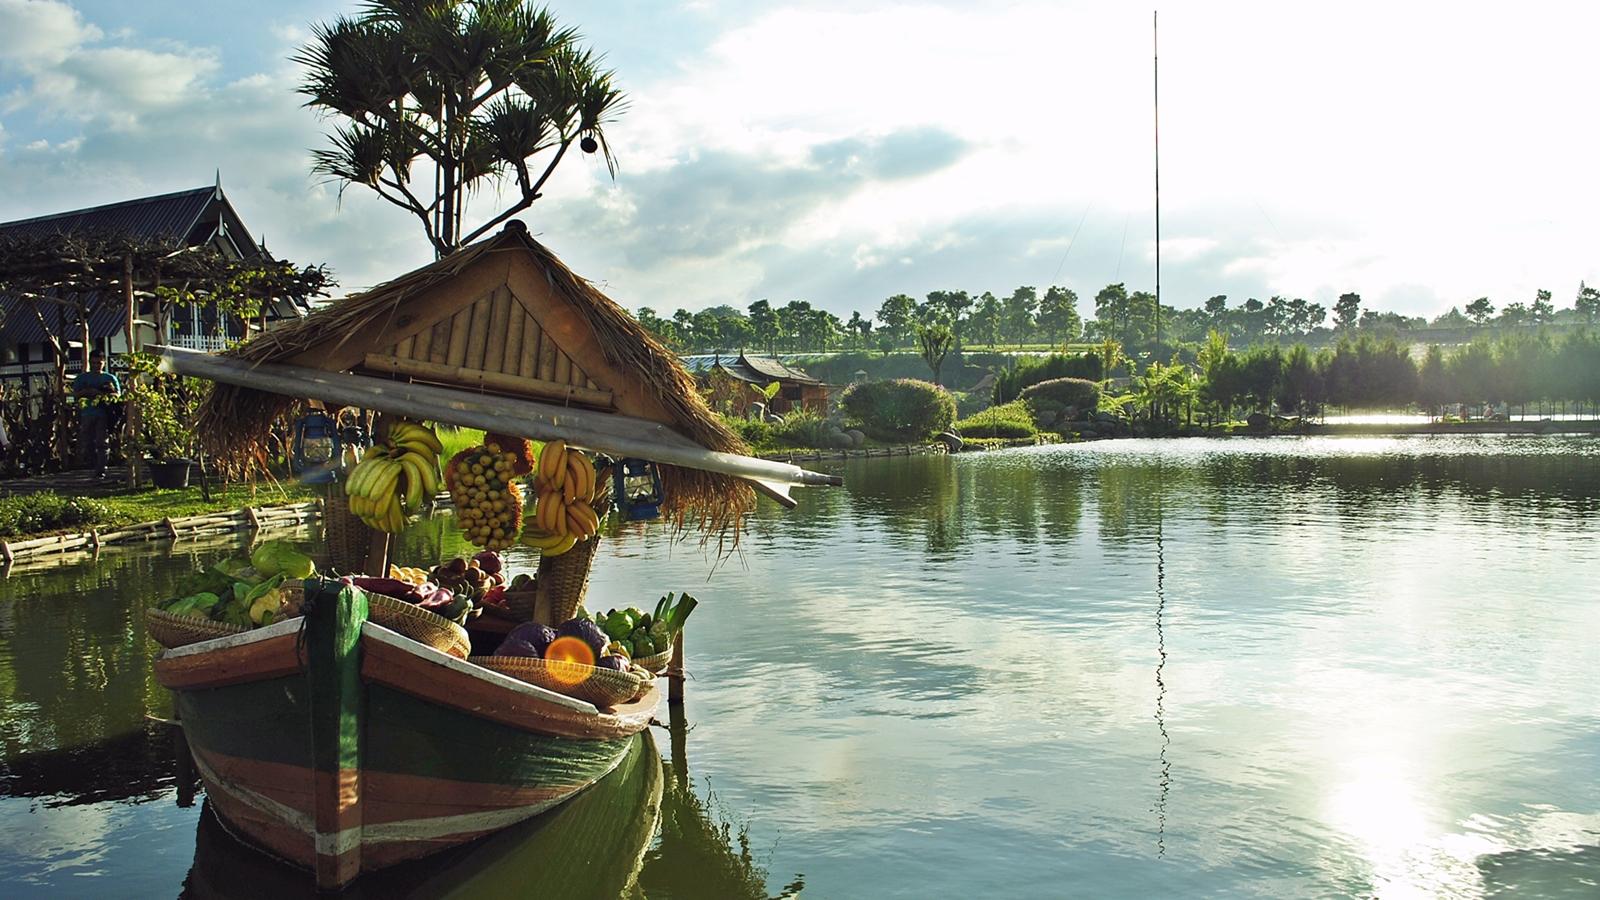 Floating Market Lembang Bandung Family Journey Pemandangan Umar Tangkuban Perahu